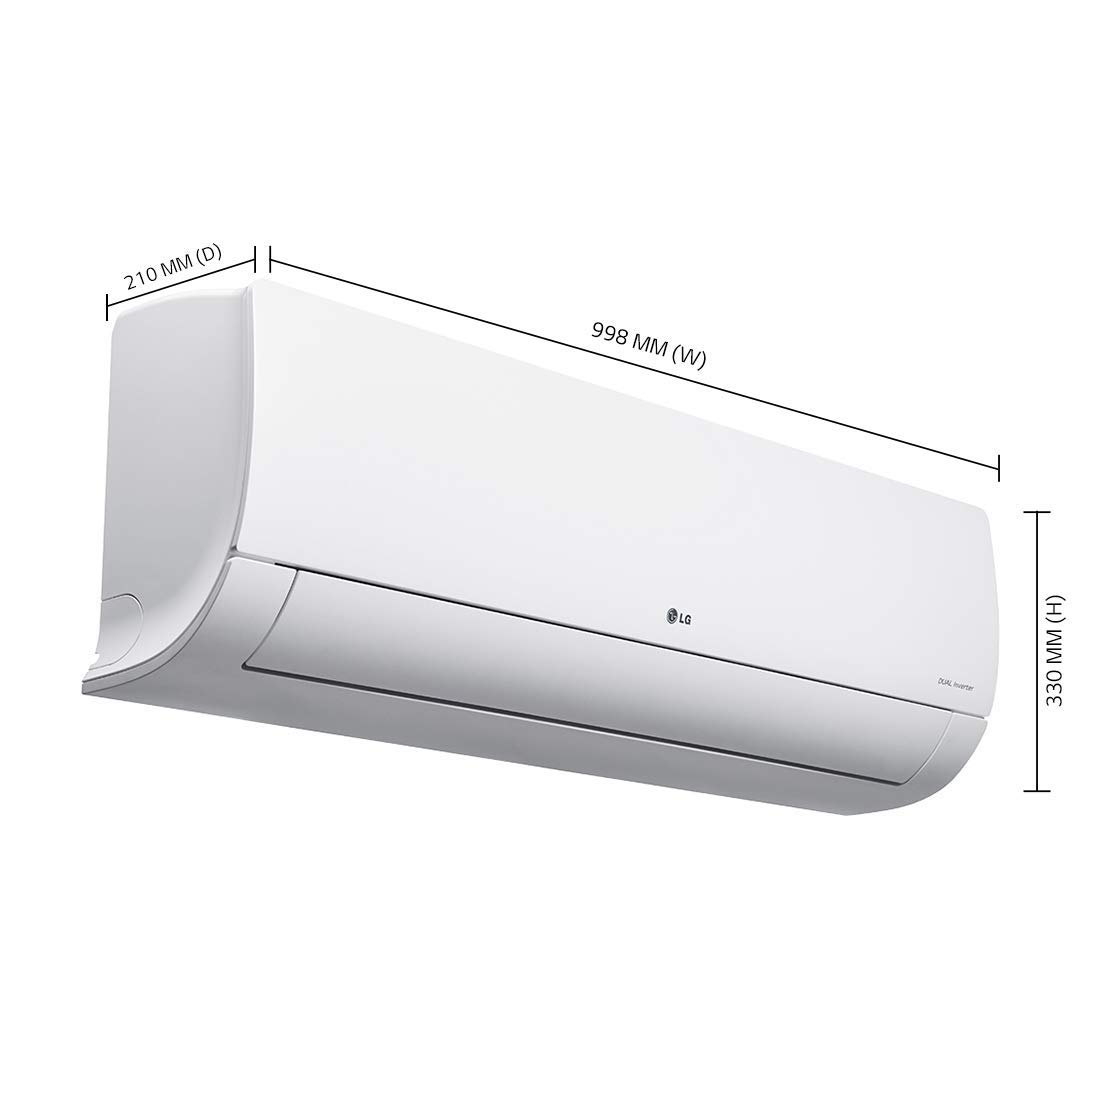 LG 2 Ton Active Energy Control 3 Star Inverter Split AC Copper, KS-Q24ENXA